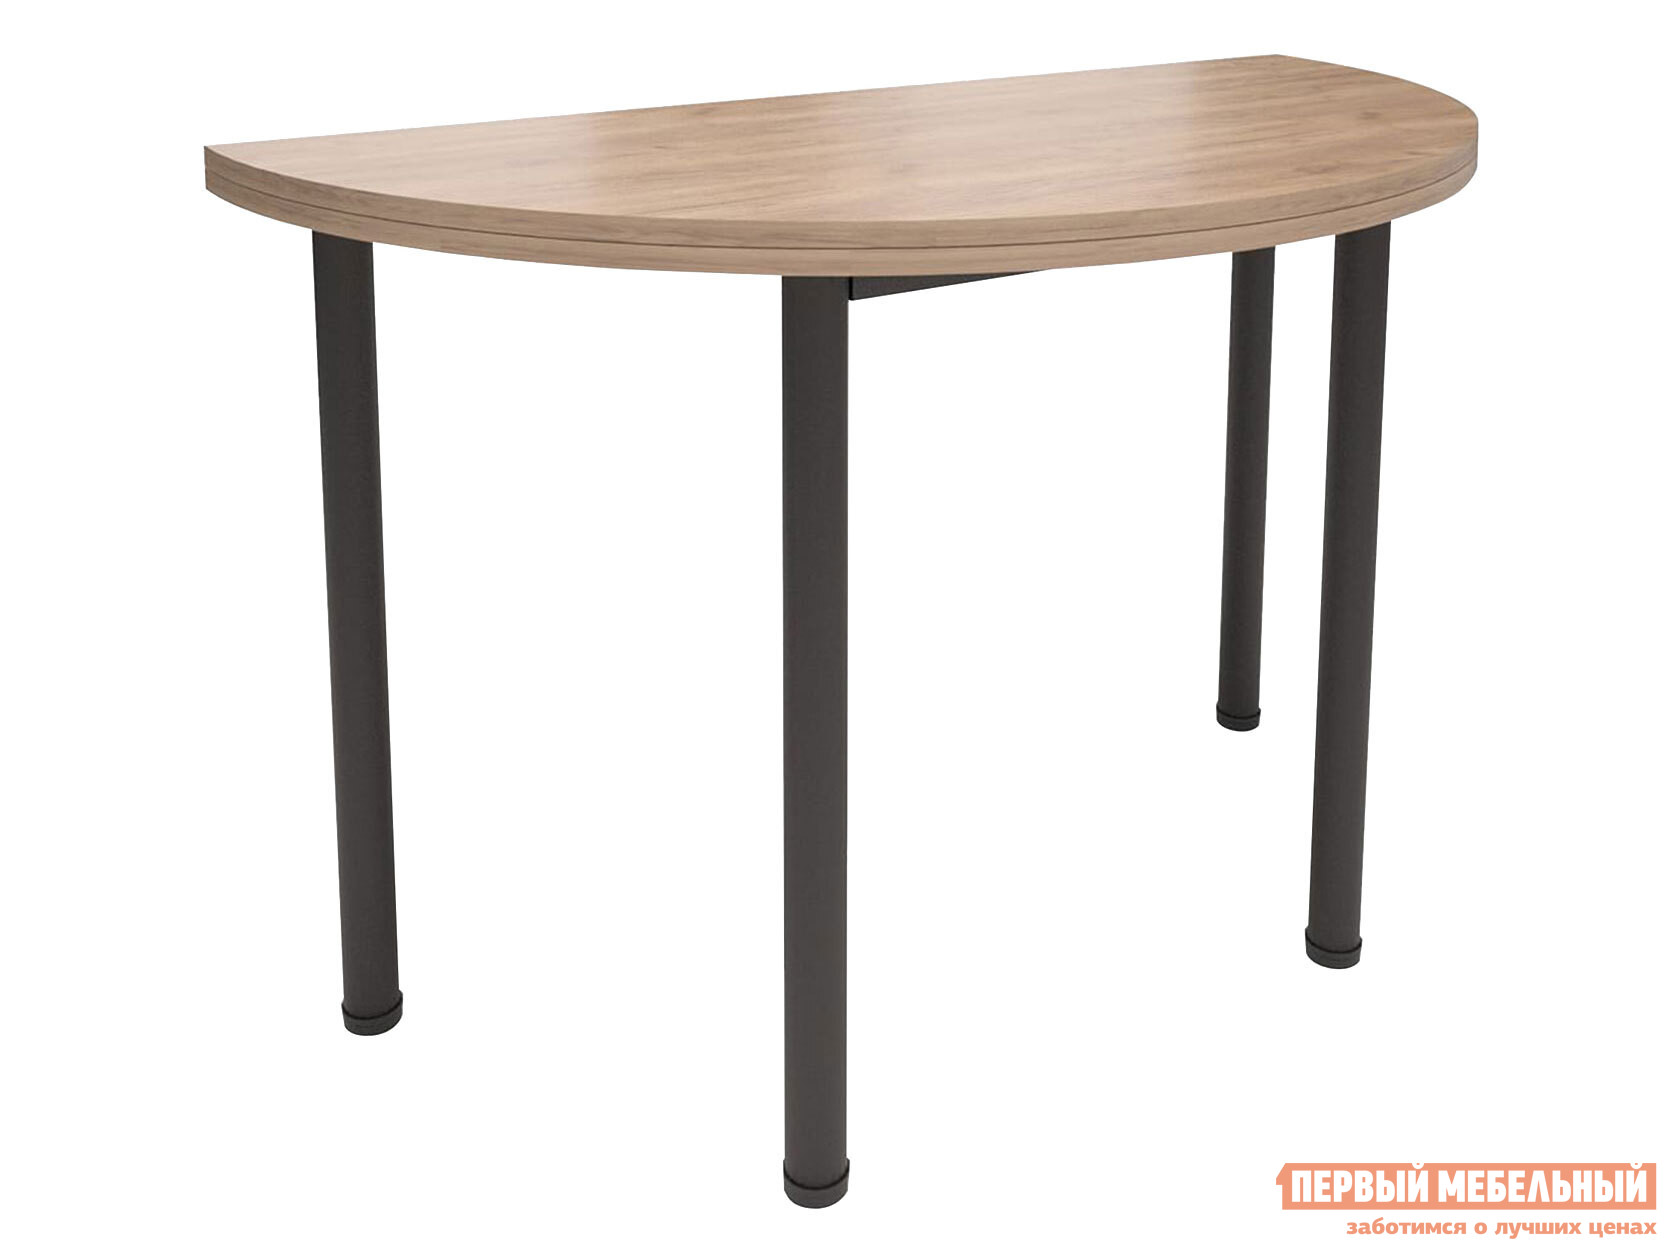 Кухонный стол  Стол-консоль Далис 1 Дуб Табачный Крафт / Черный муар MillWood 123231